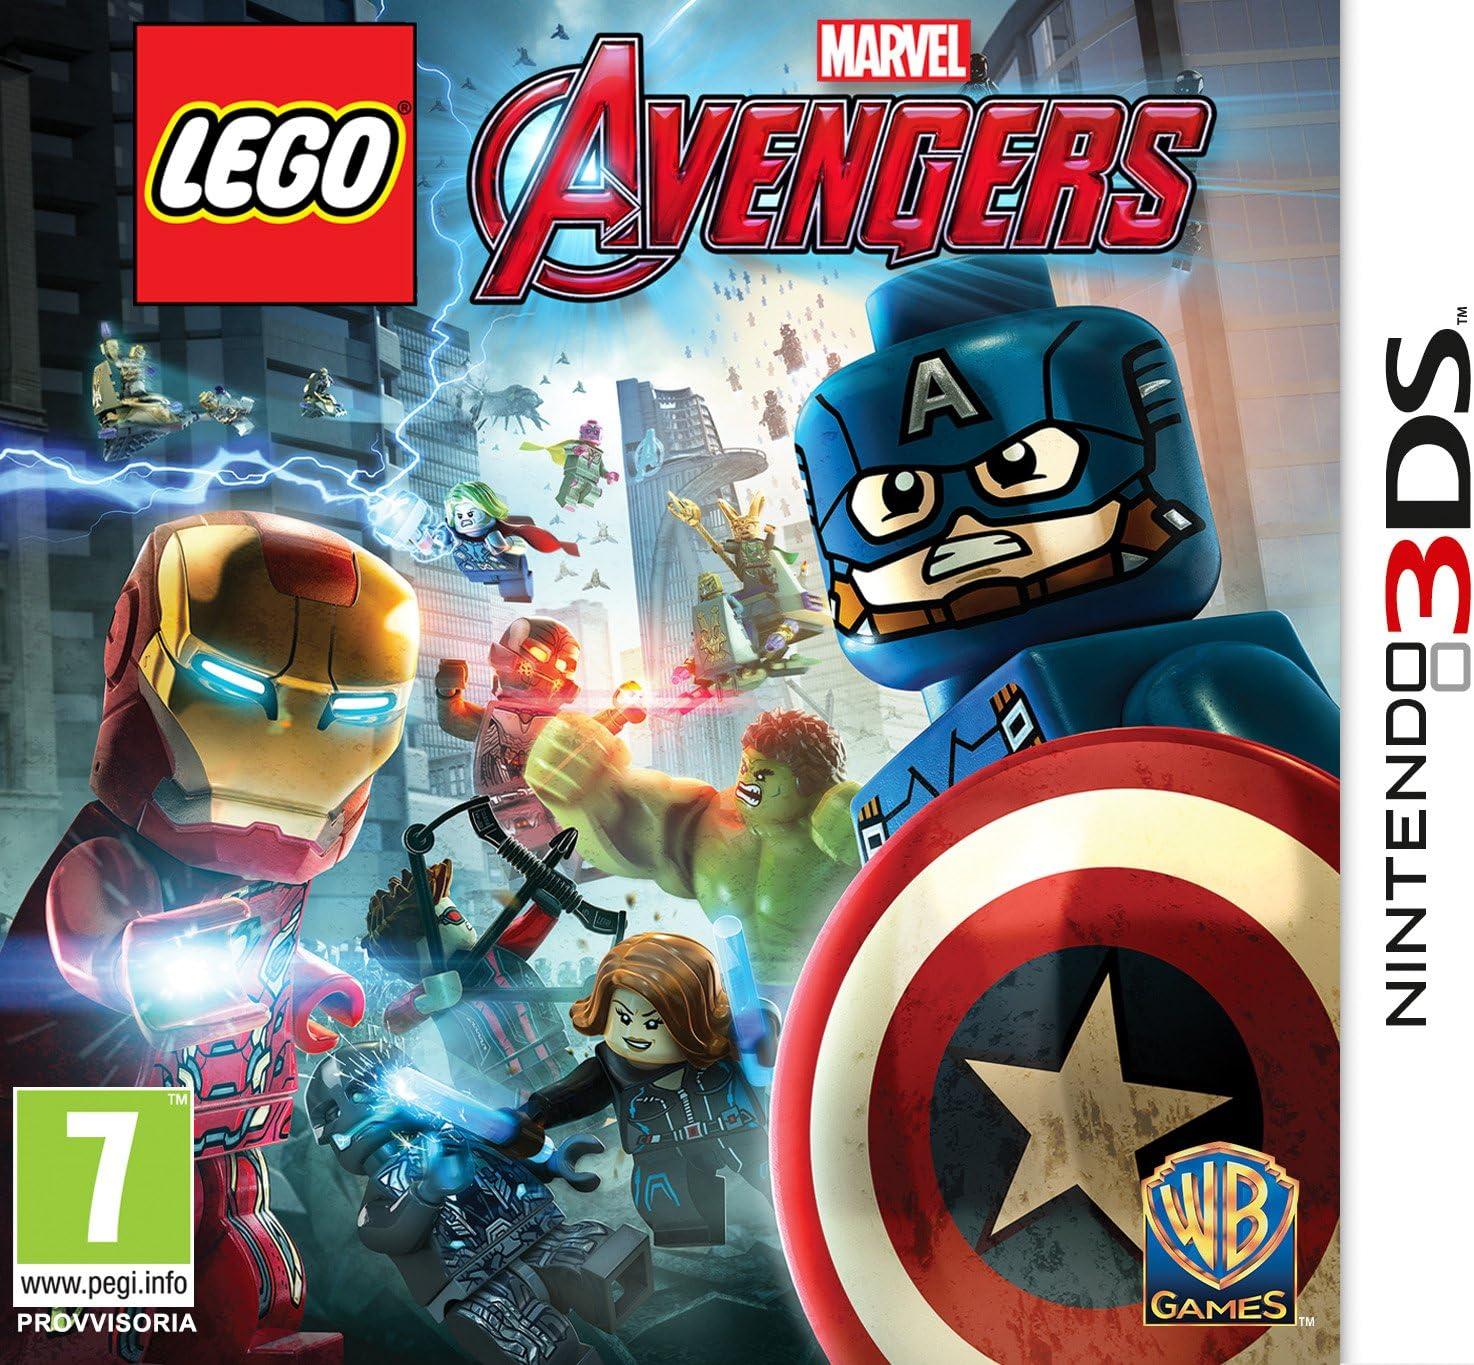 Lego Marvel Avengers: Amazon.es: Videojuegos